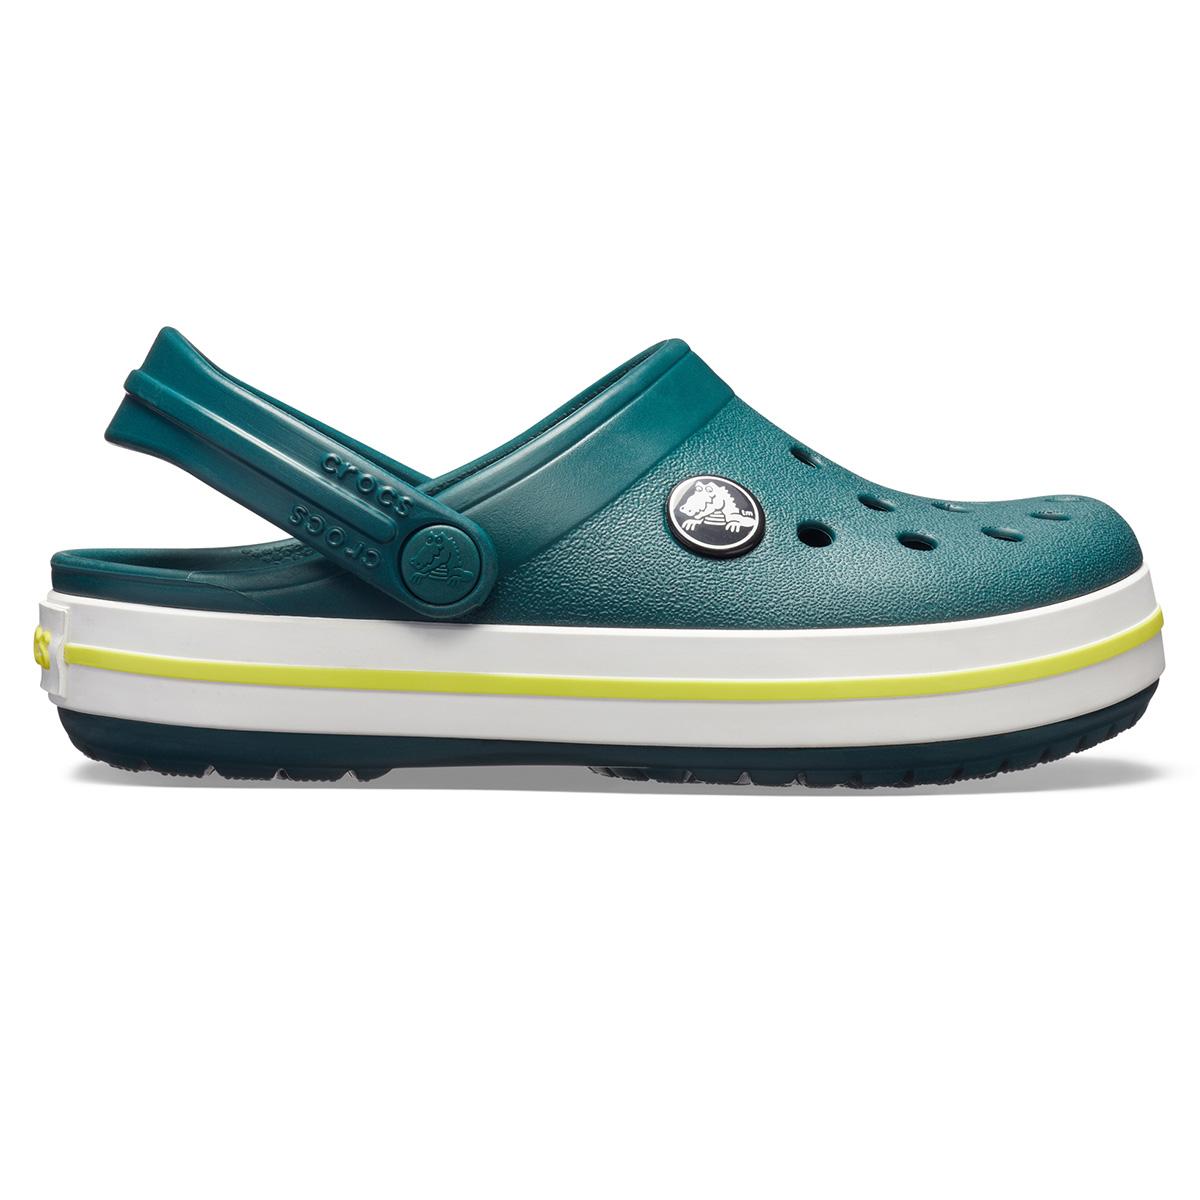 Crocs Crocband Clog K - Çam Yeşili